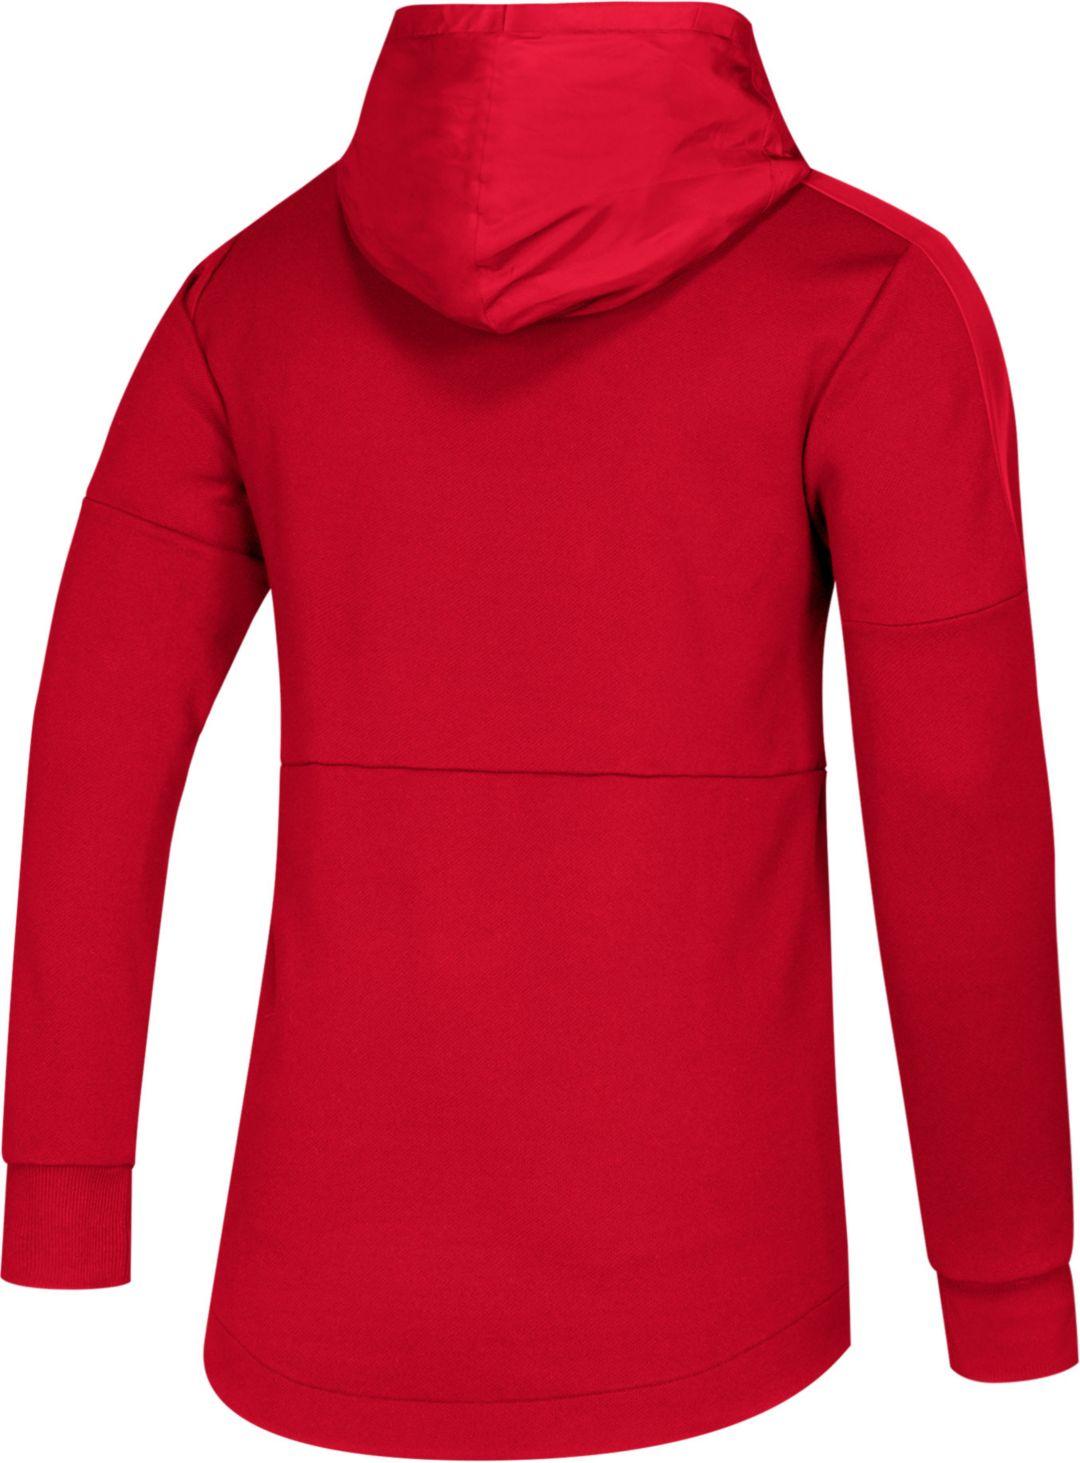 meet e5fbc 4100d adidas Men's Louisville Cardinals Cardinal Red Game Mode Sideline Pullover  Hoodie